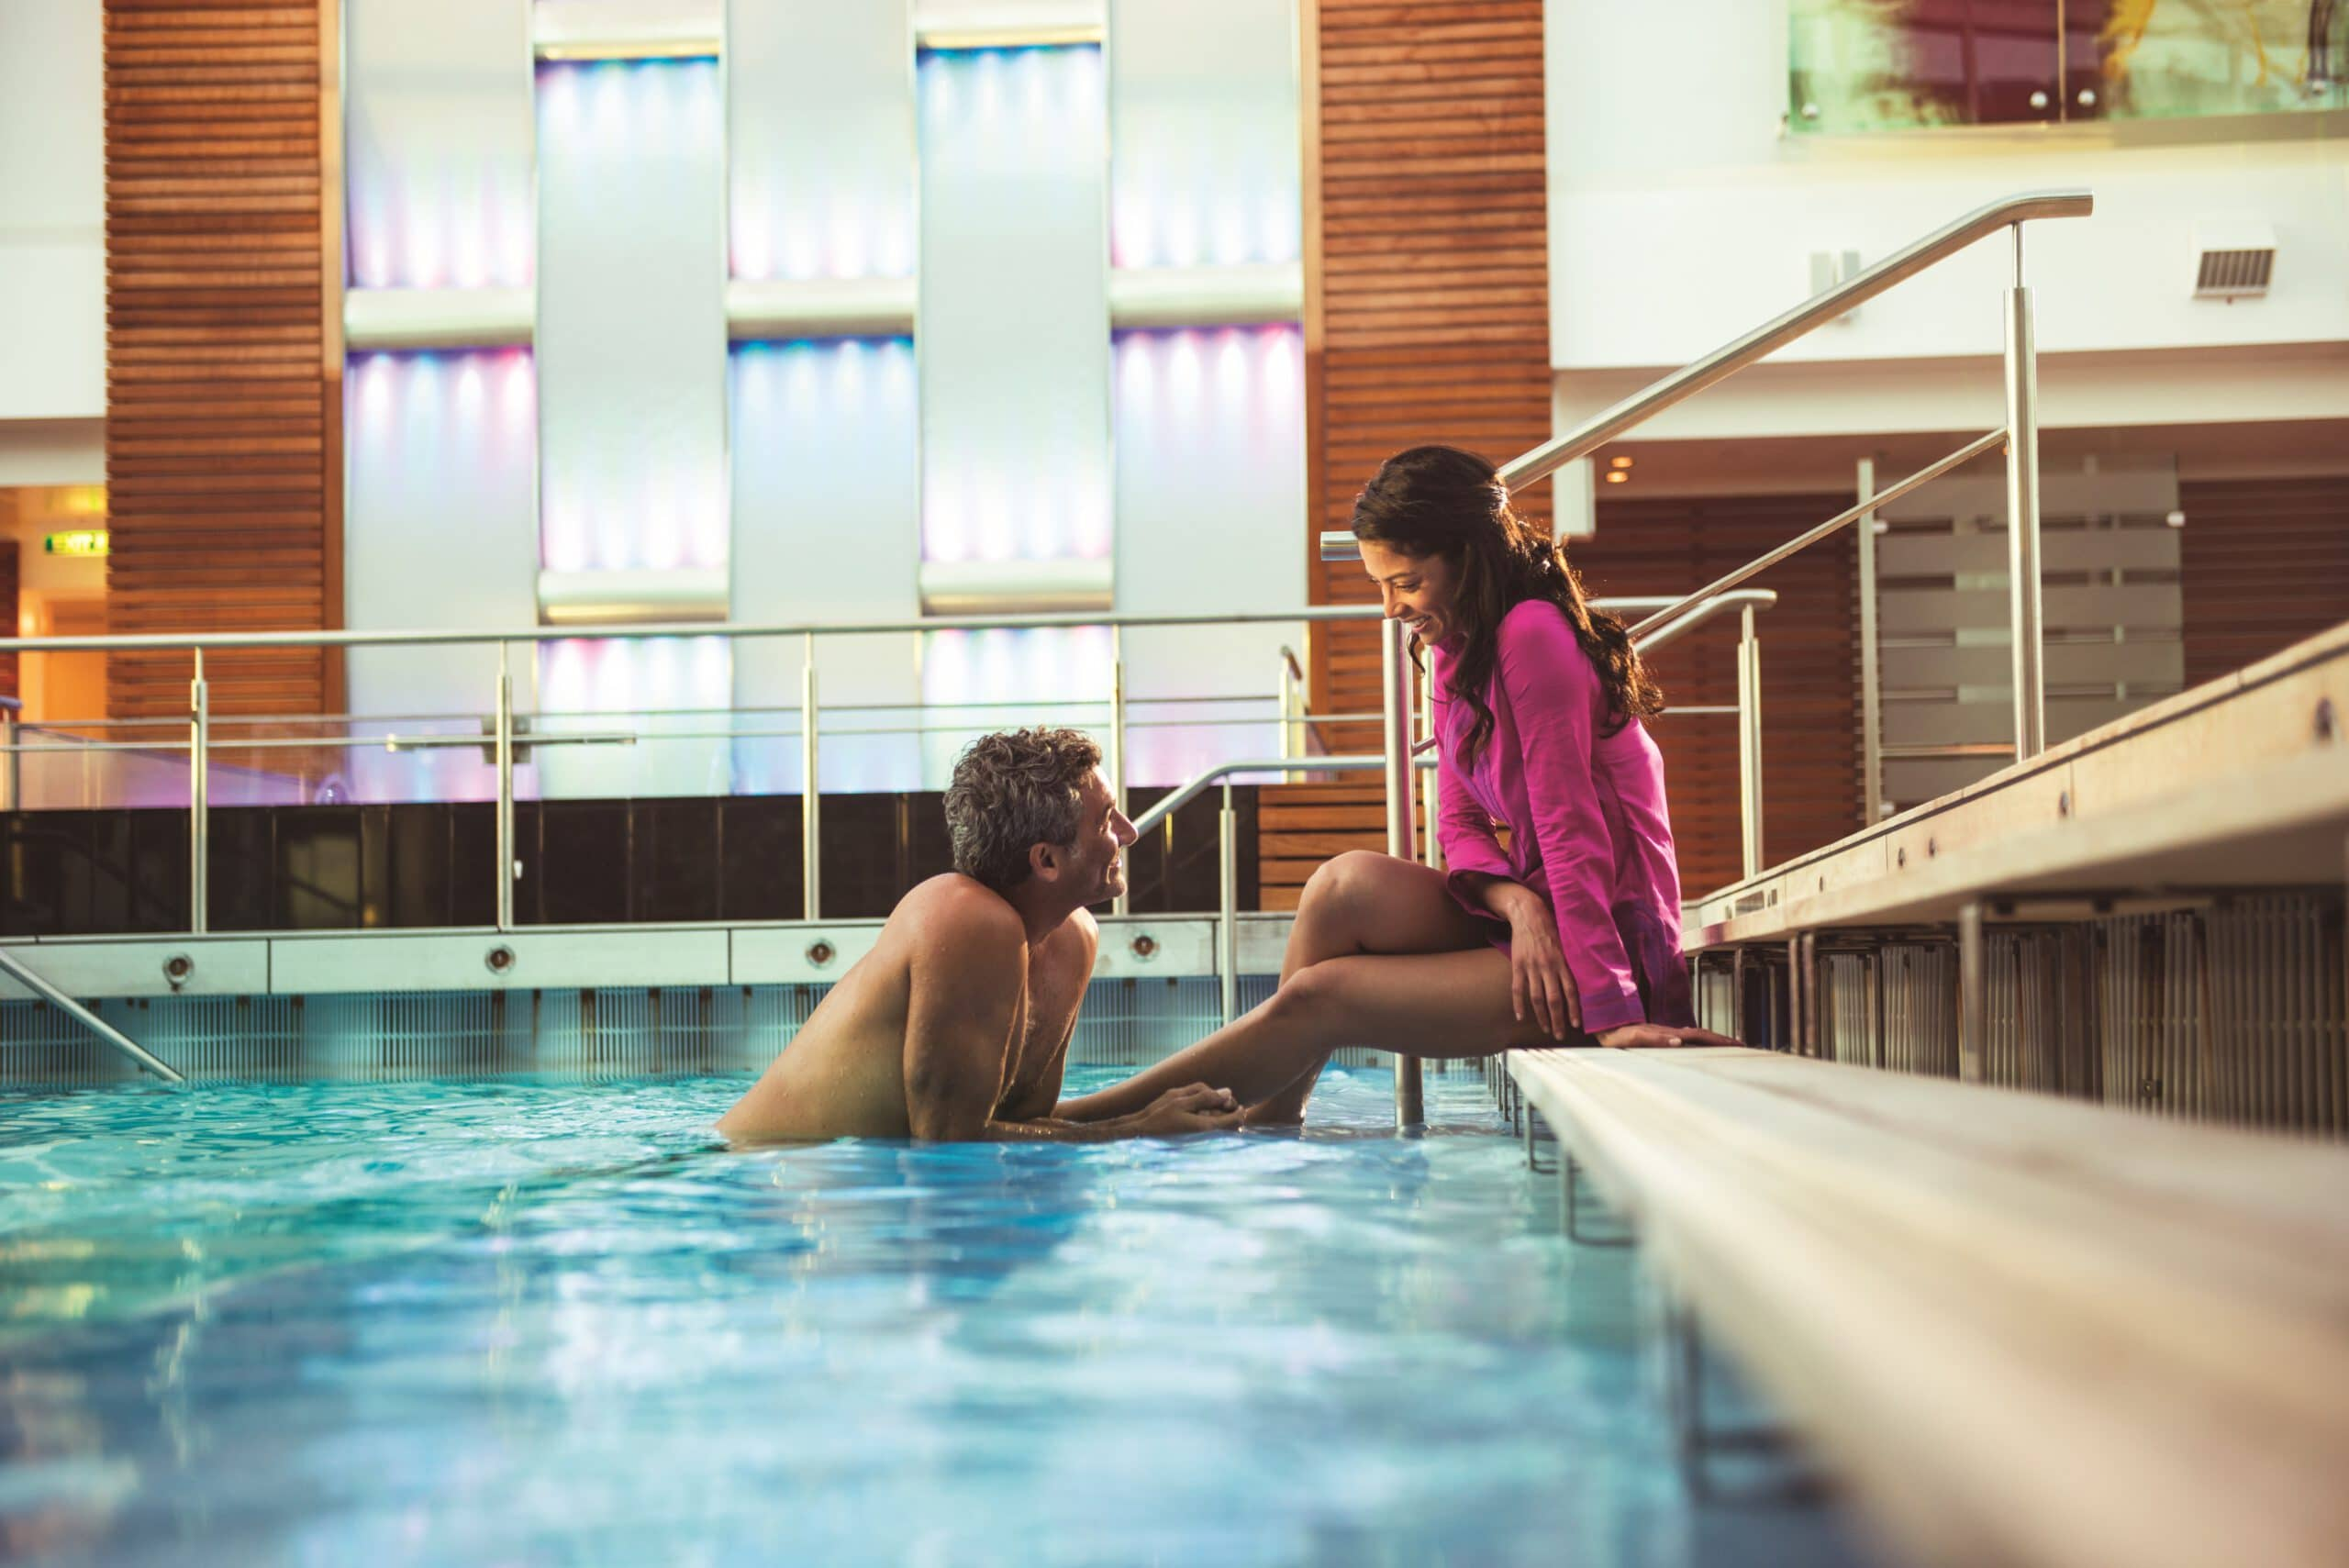 Cruiseschip-Celebrity Reflection-Celebrity Cruises-Binnenzwembad